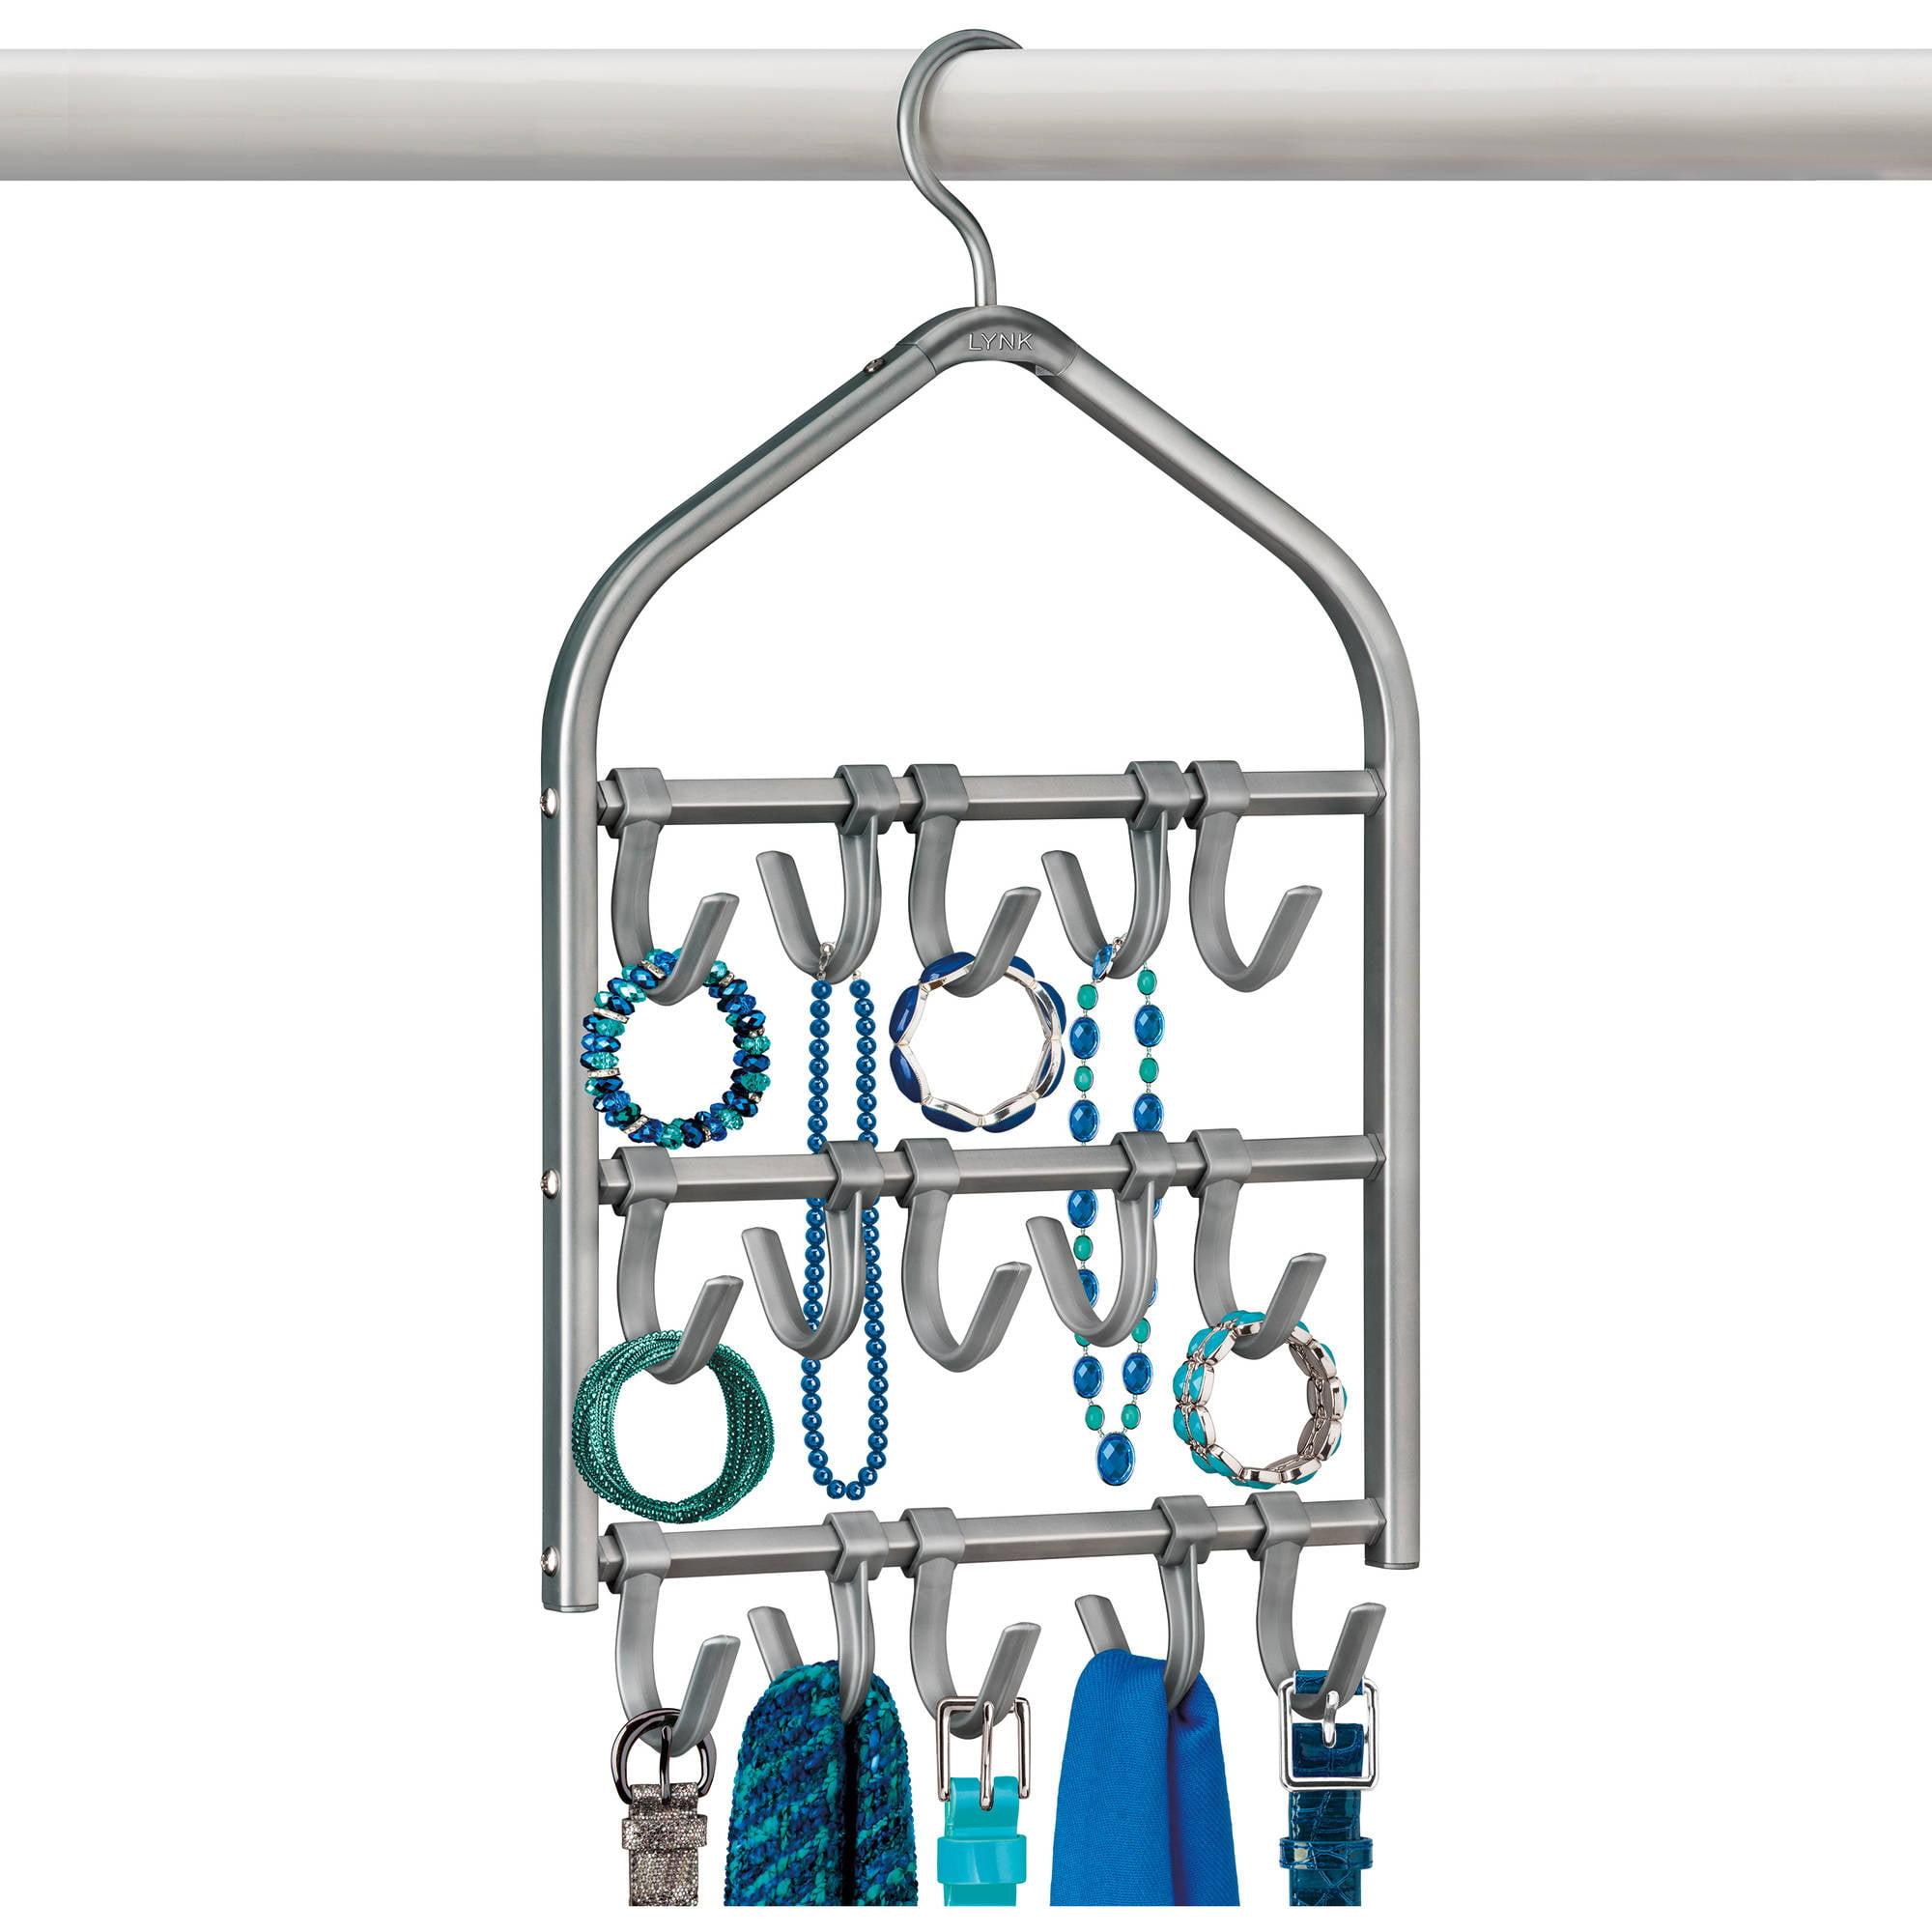 Lynk Double Sided Scarf Hanger - Belt, Hat, Jewelry, Accessory Holder - 15 Hook Closet Organizer Rack - Platinum